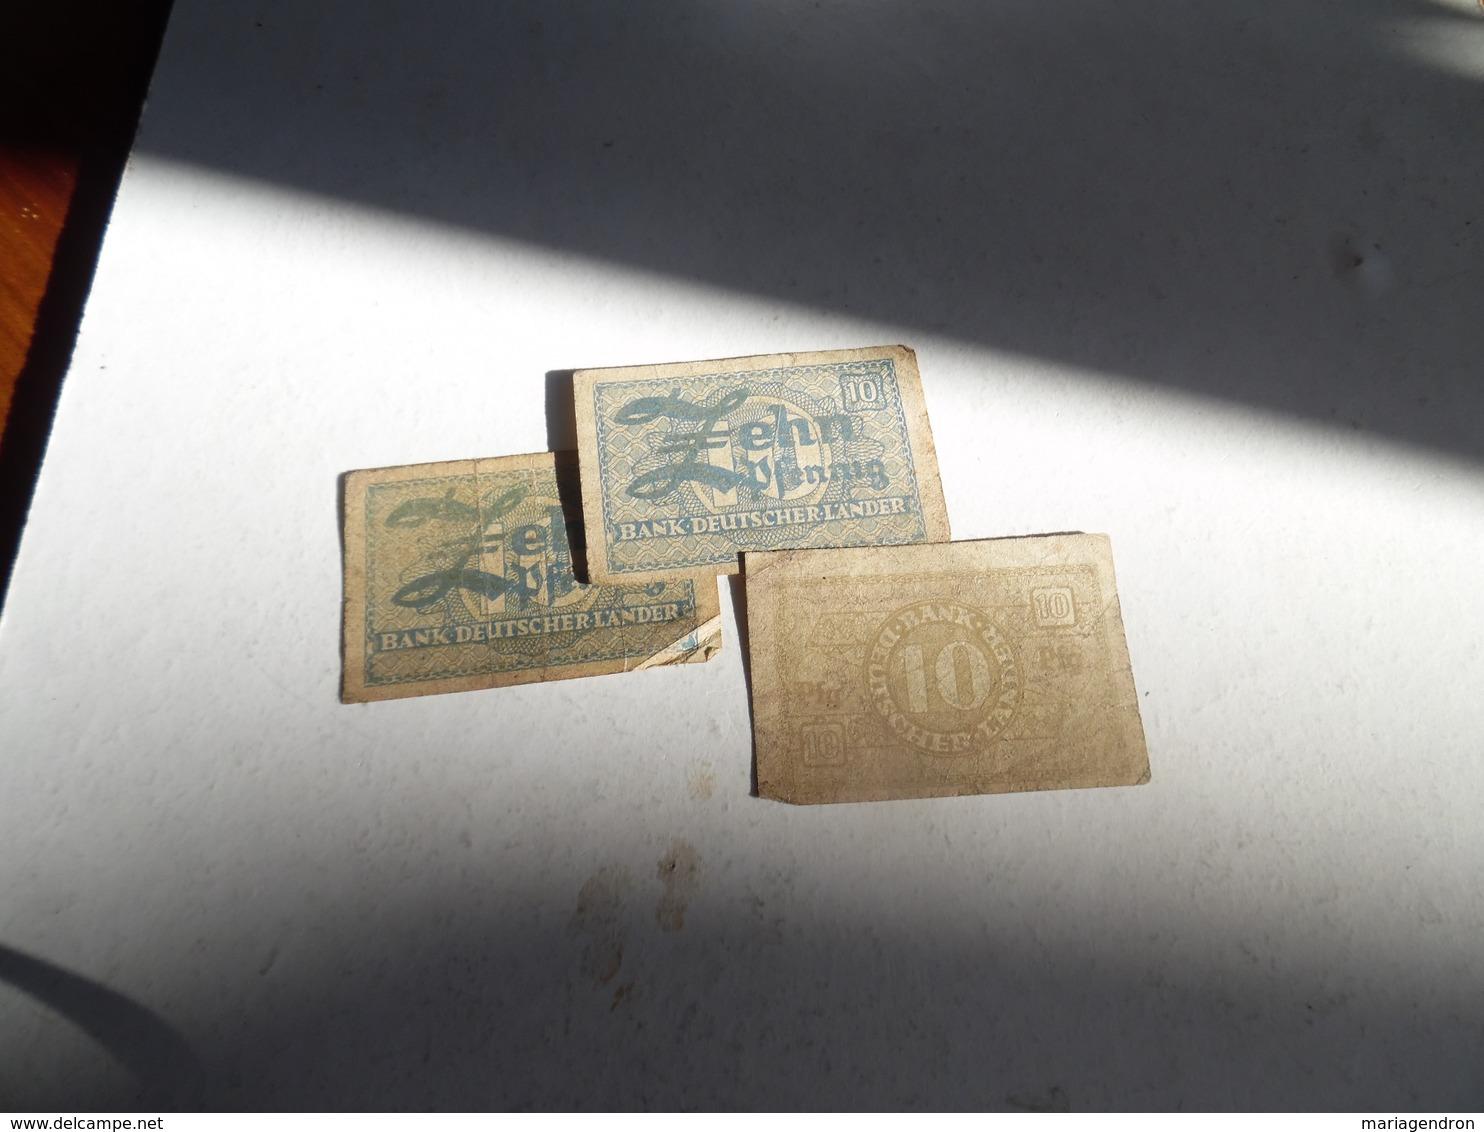 3 Billets D'Allemagne De 10 Pfennig - [ 5] 1945-1949 : Occupazione Degli Alleati